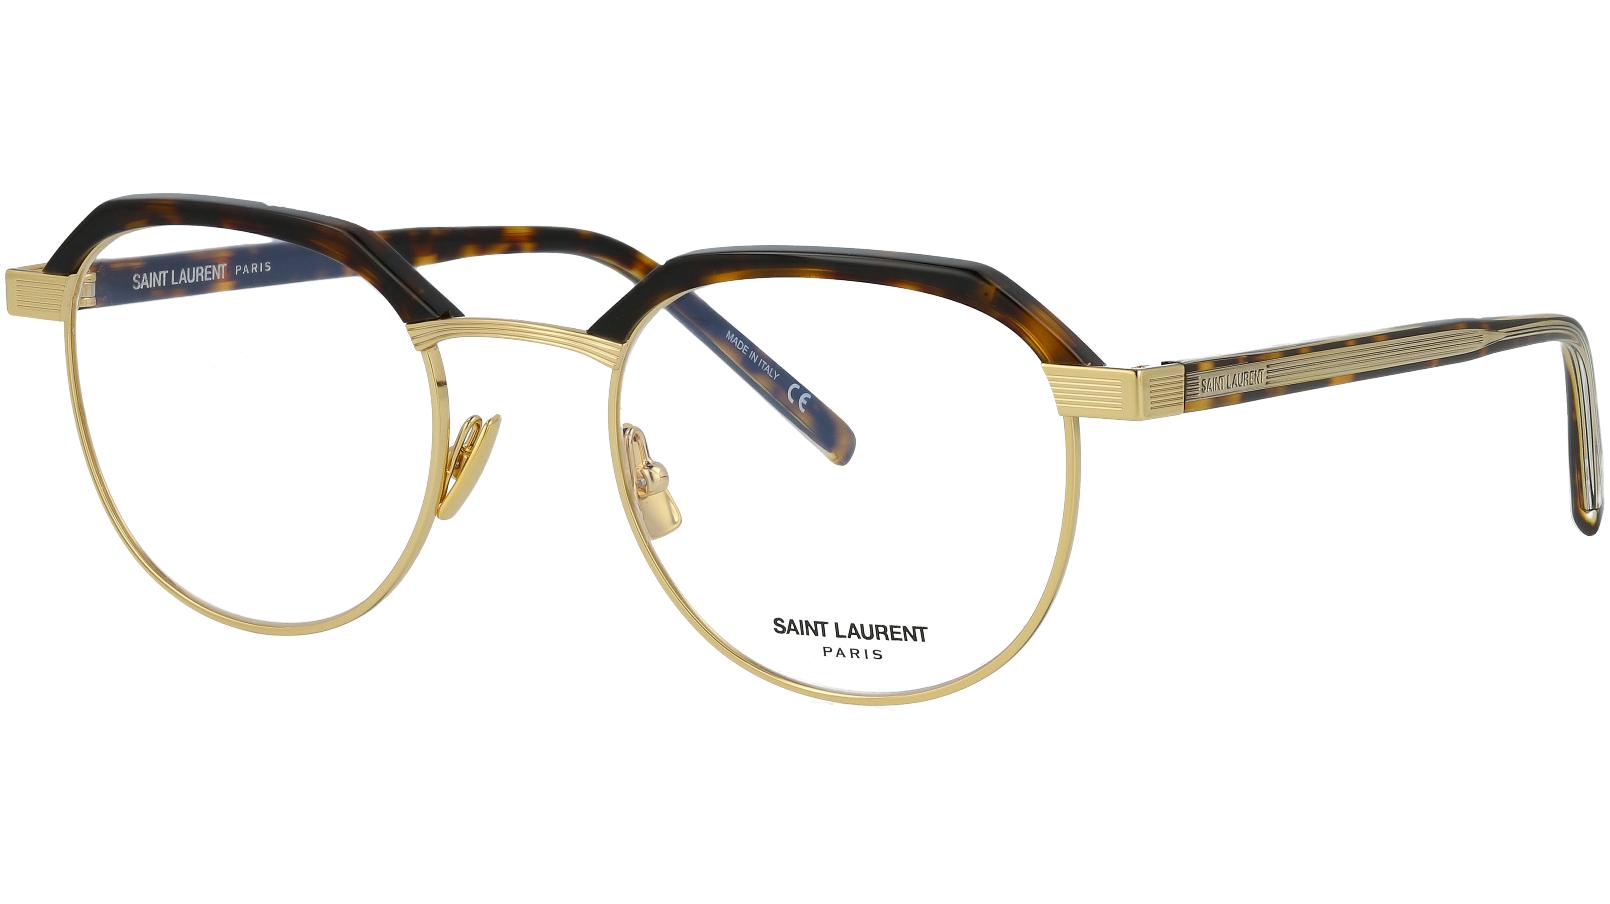 Saint Laurent SL124 003 50 Avana Glasses